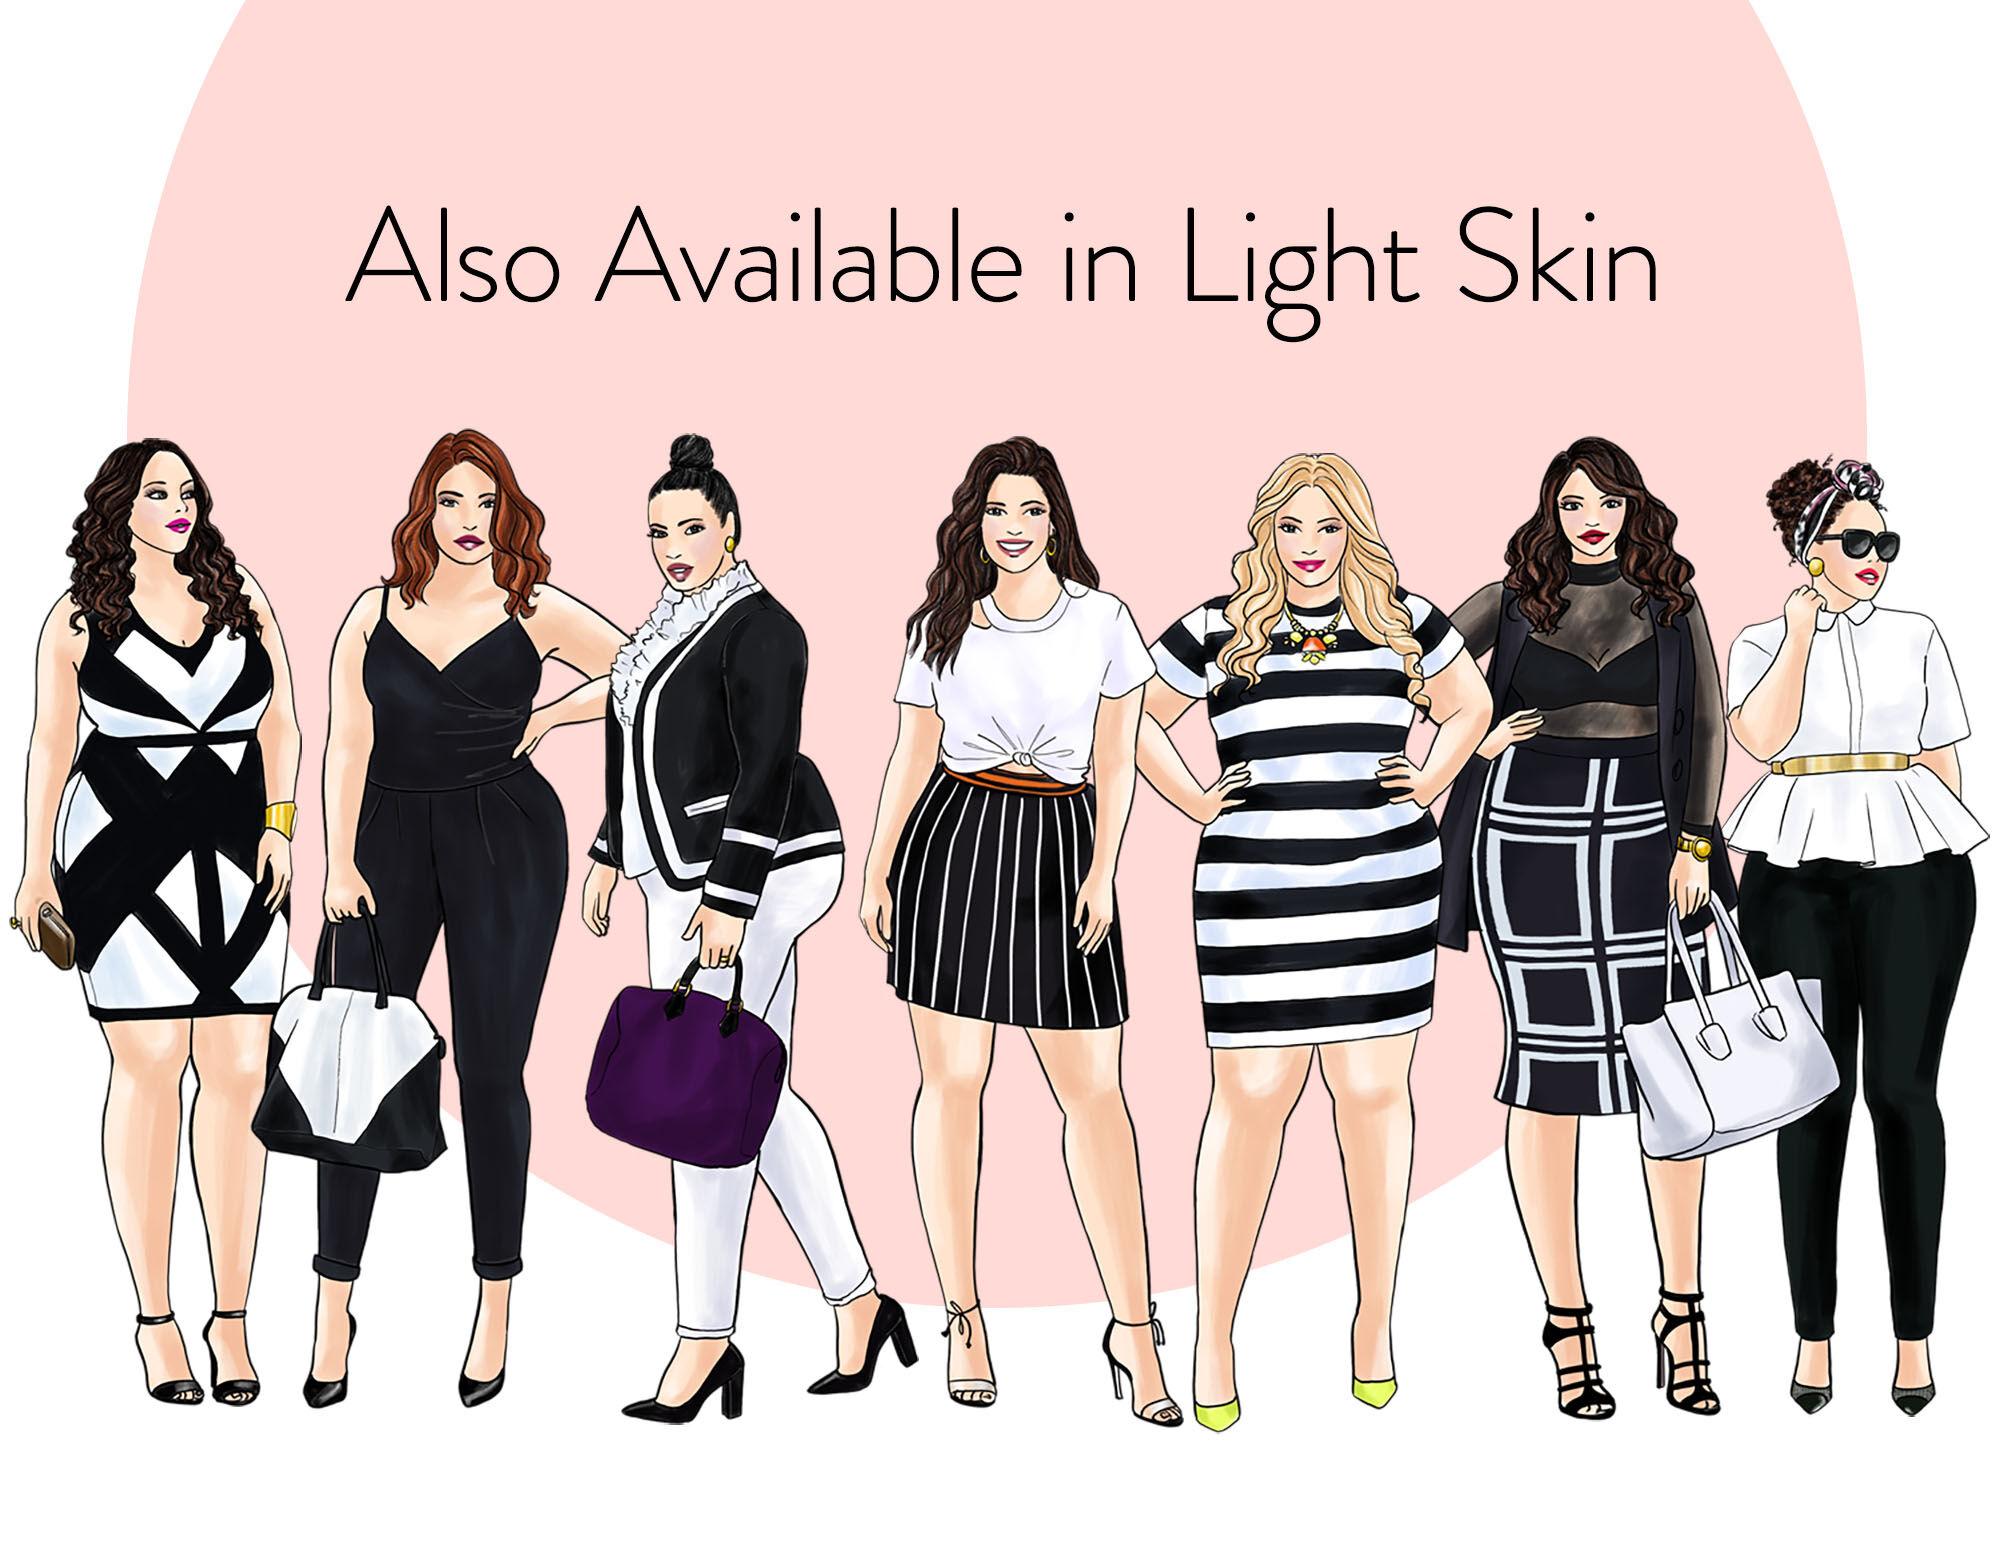 Watercolor Fashion Clipart Curvy Girls In Black White Dark Skin By Parinaz Wadia Design Thehungryjpeg Com